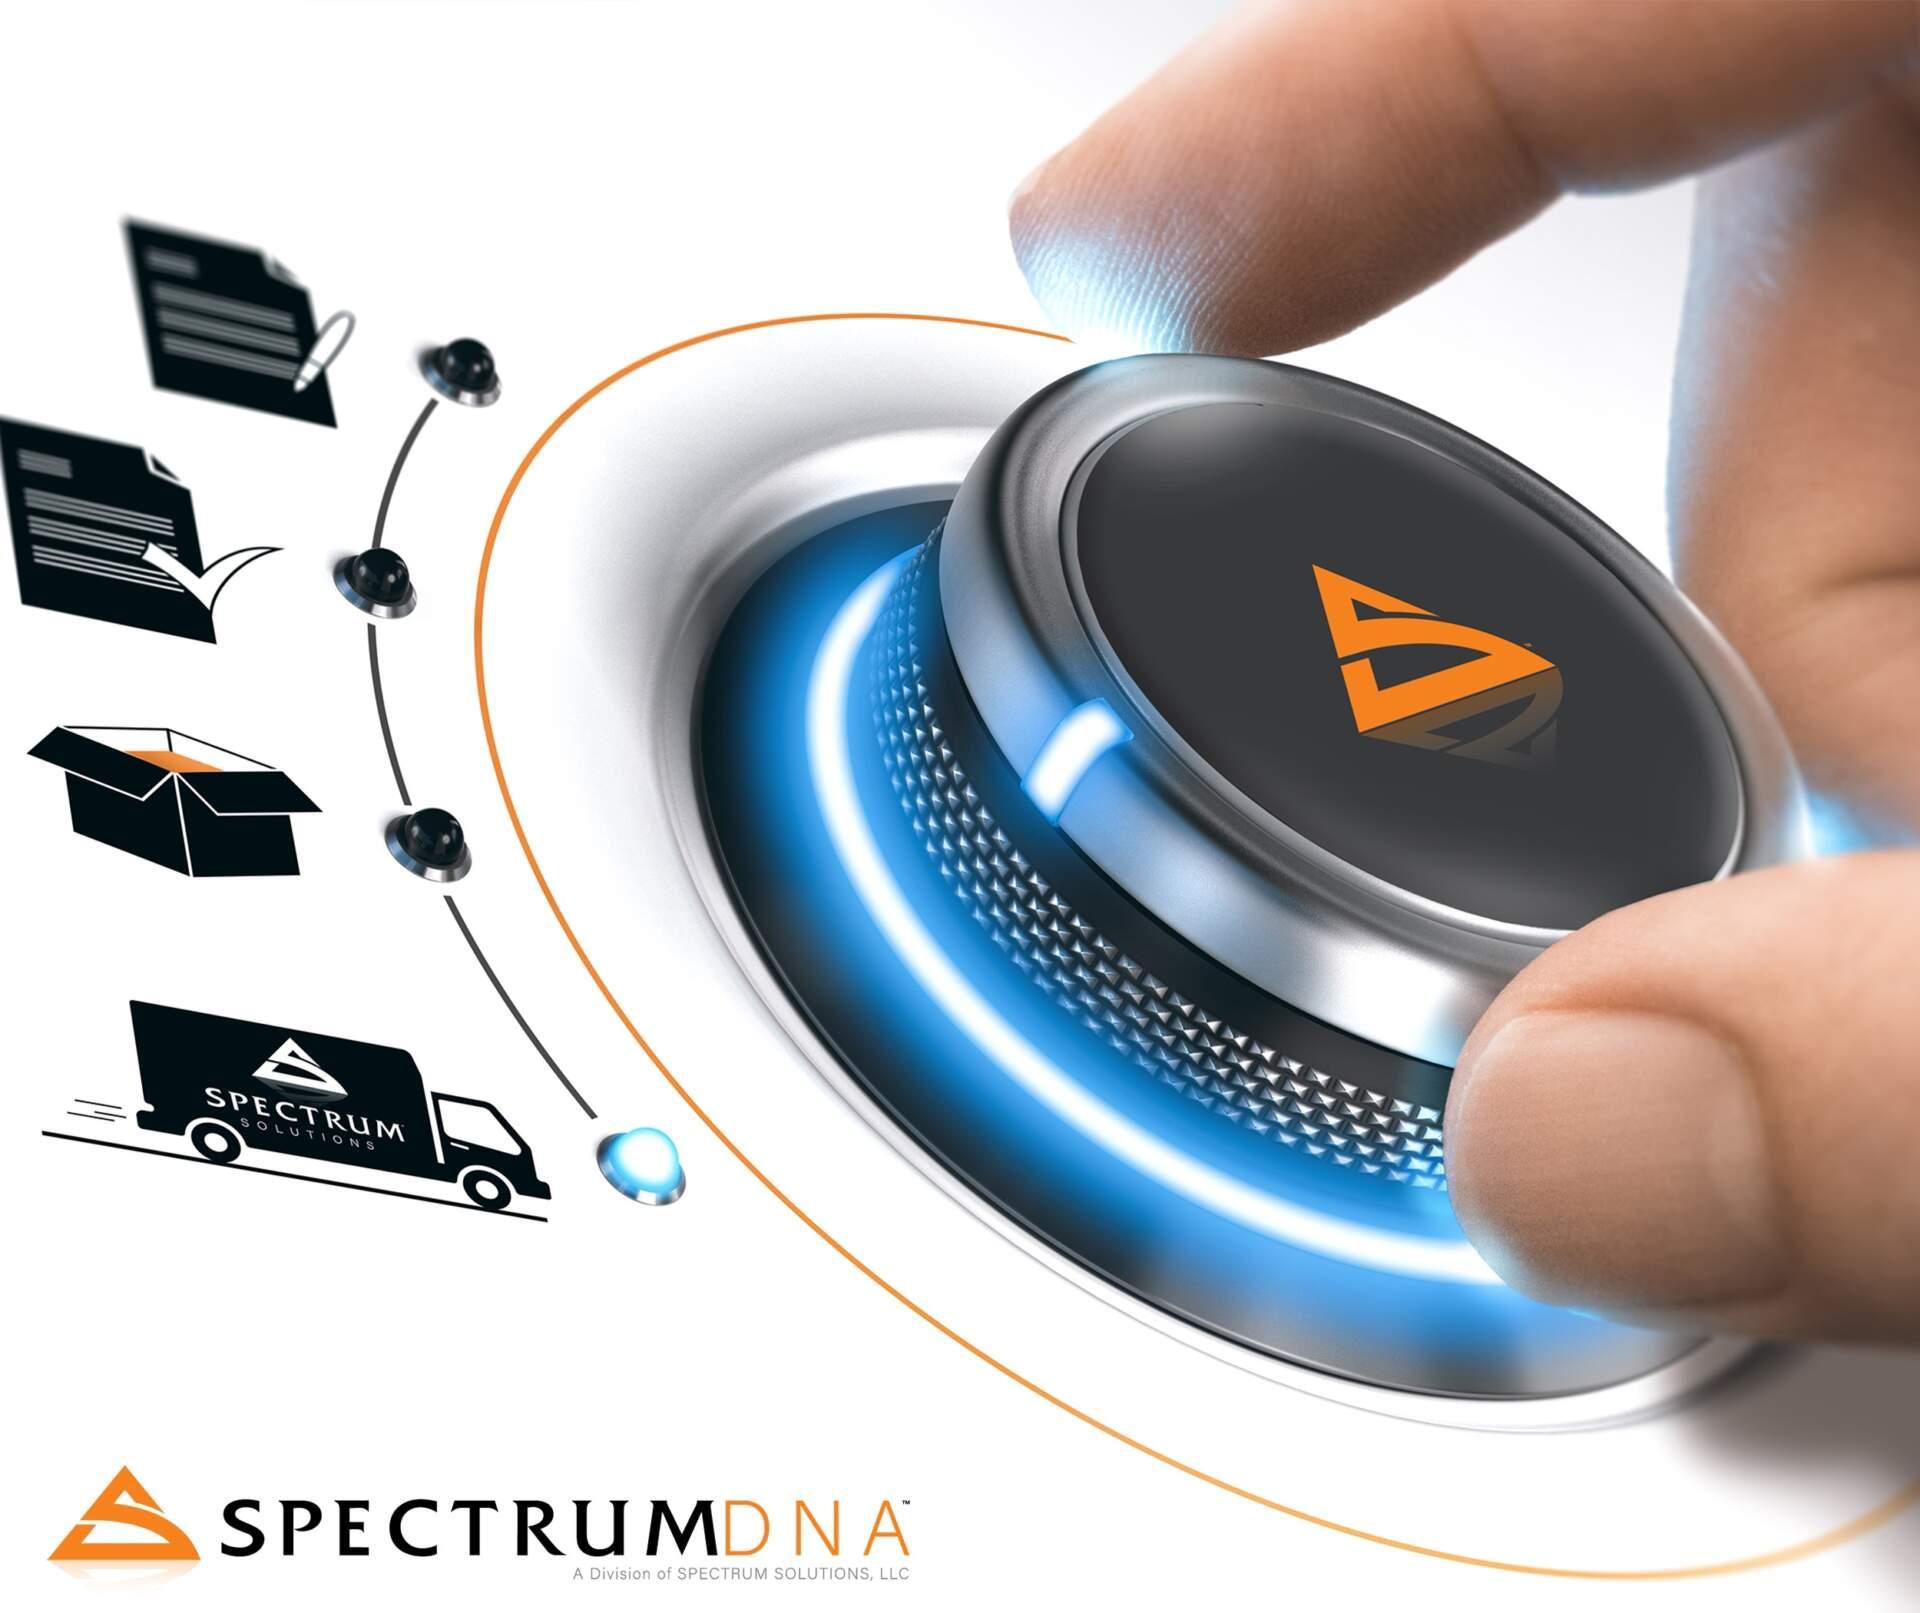 Spectrum DNA - Order Fulfillment